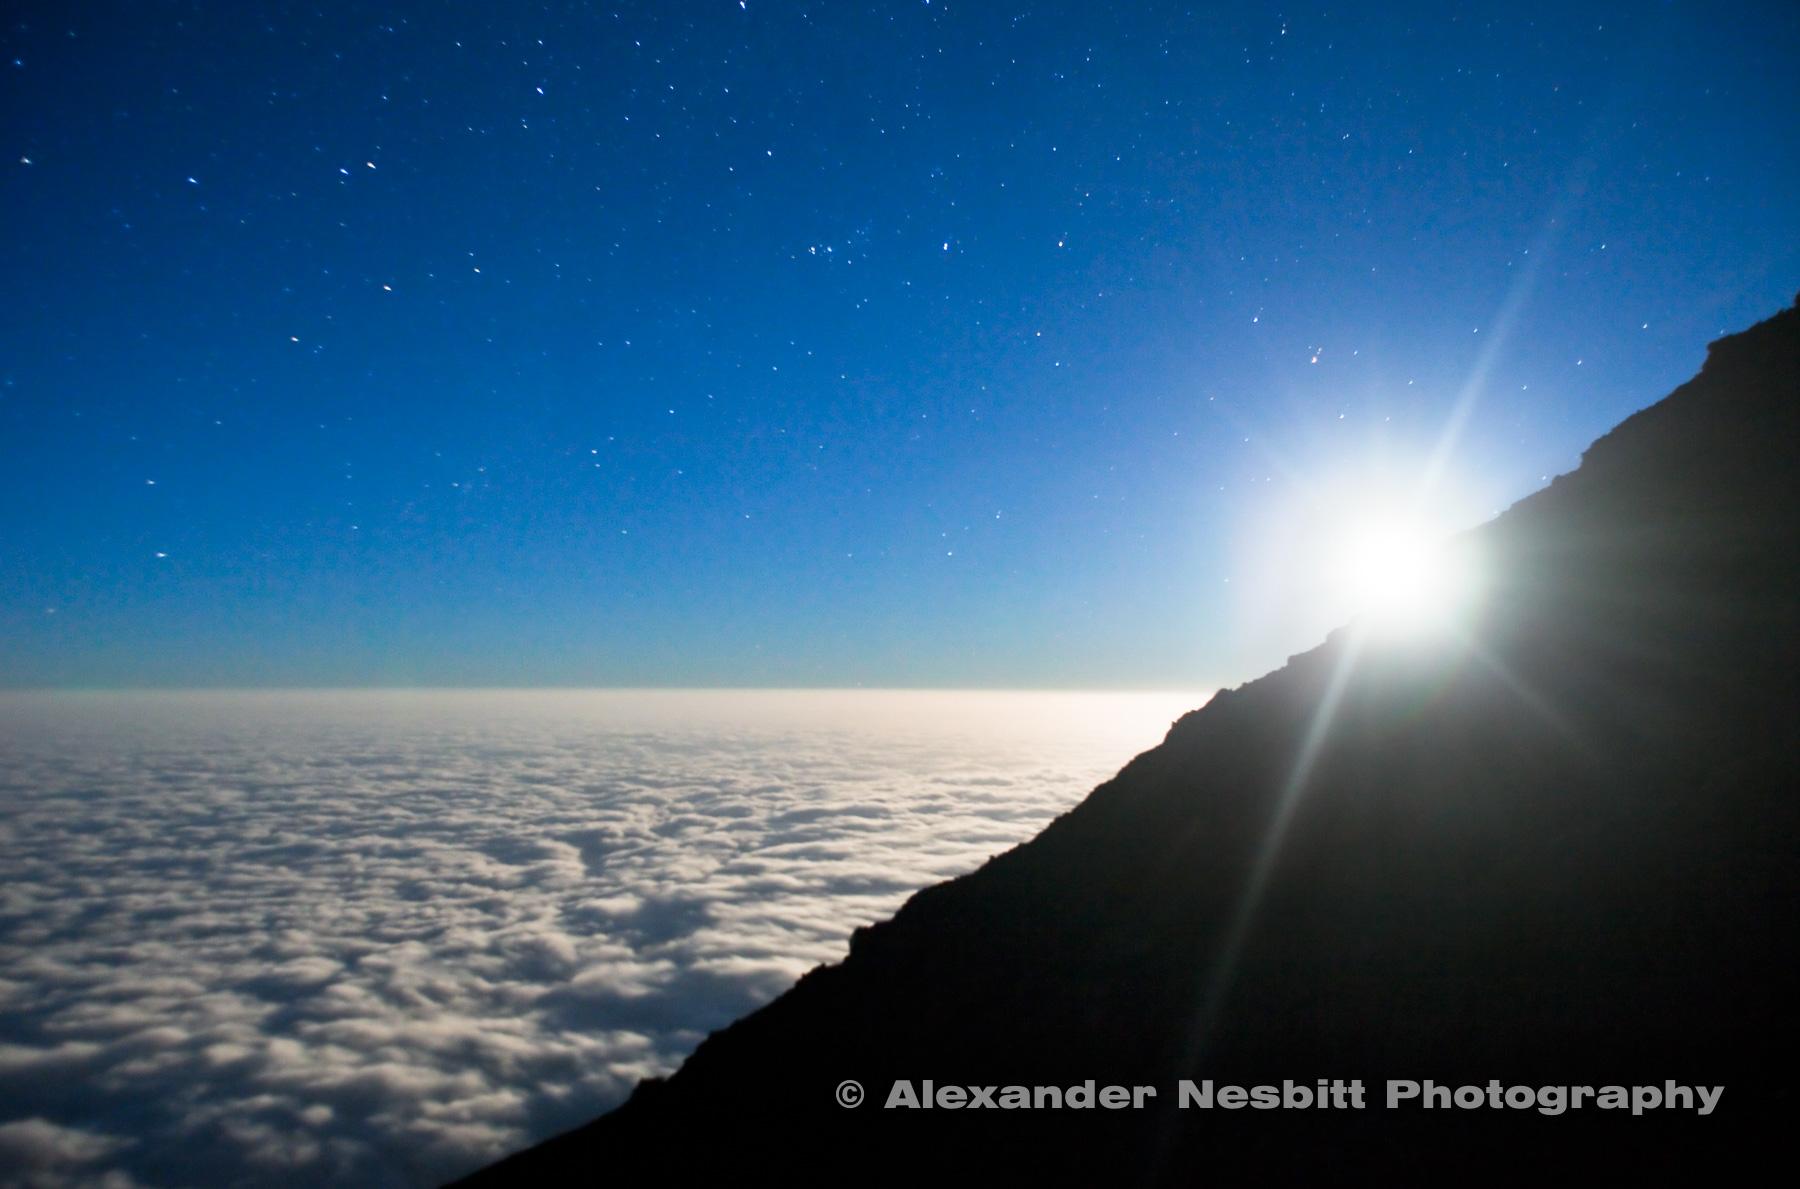 Climbing Mt. Kilimanjaro